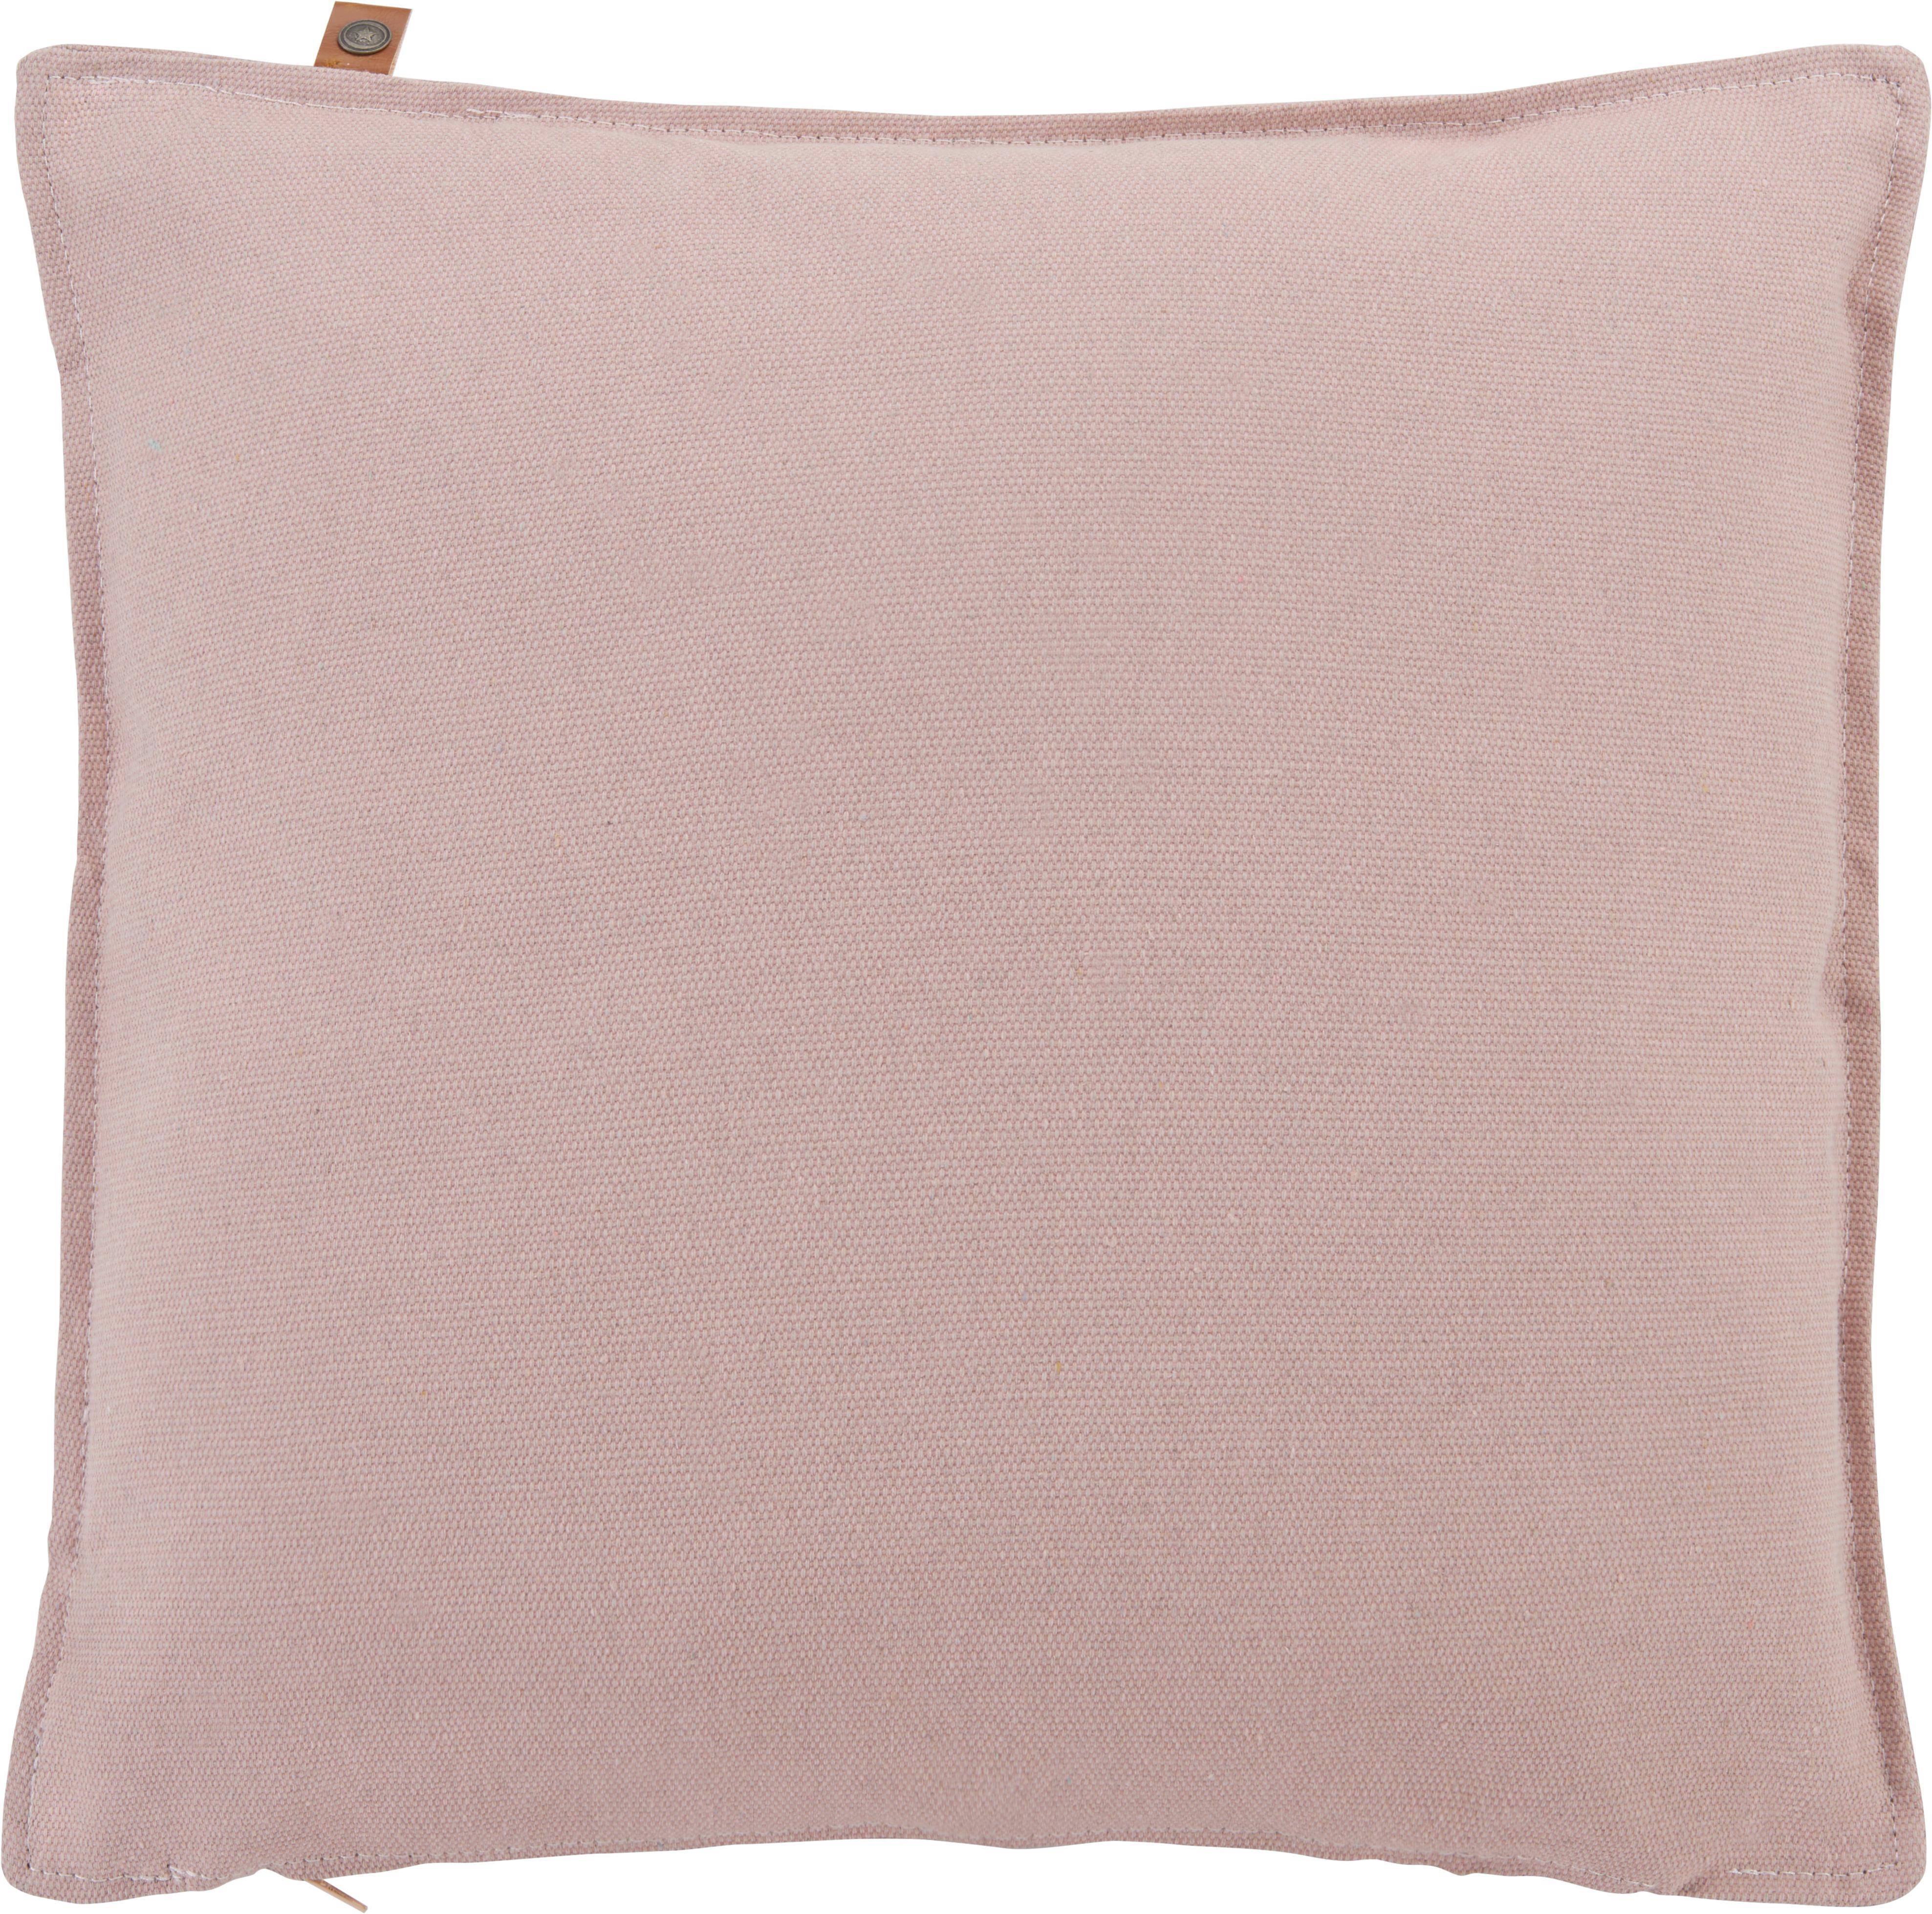 Zierkissen Jenna 45x45cm - Rosa, MODERN, Textil (45/45cm)